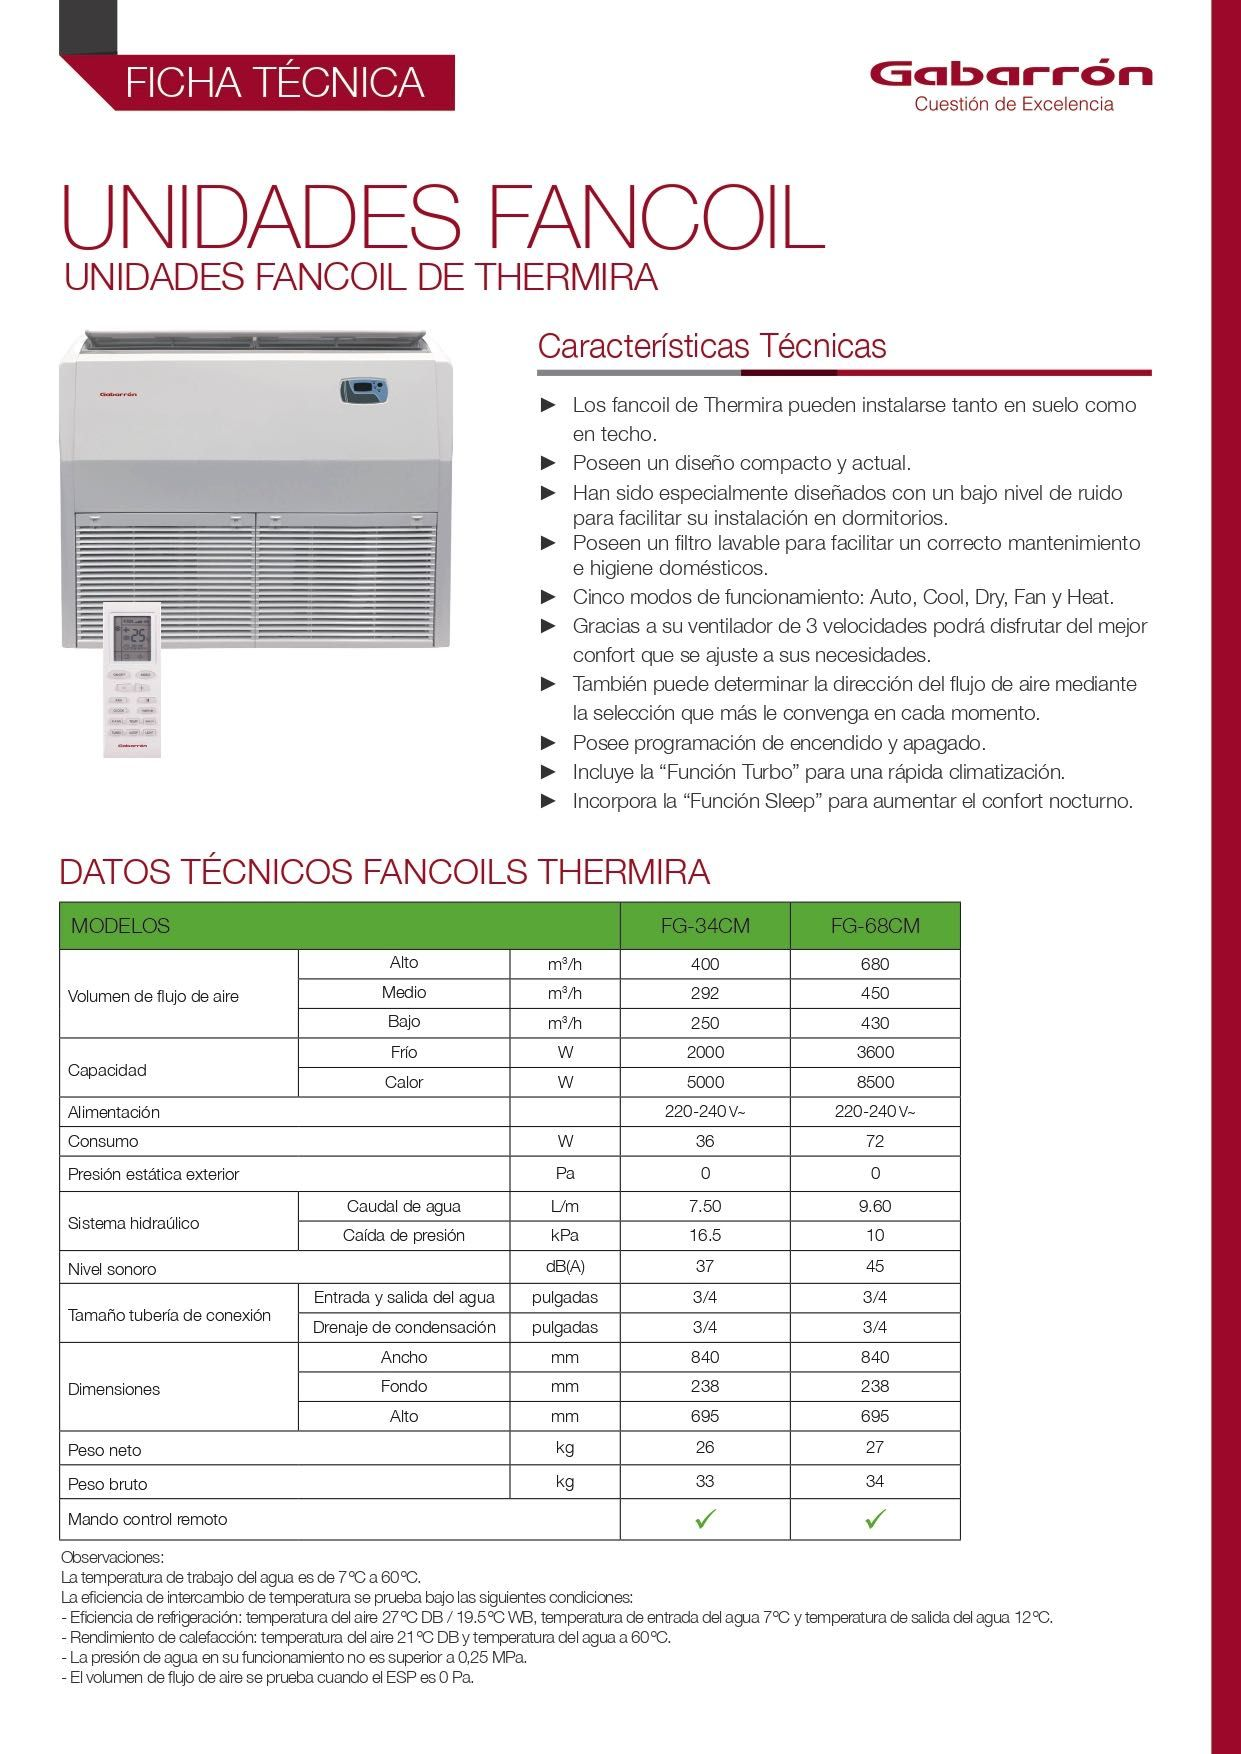 Ficha técnica Fancoil Gabarrón Thermira